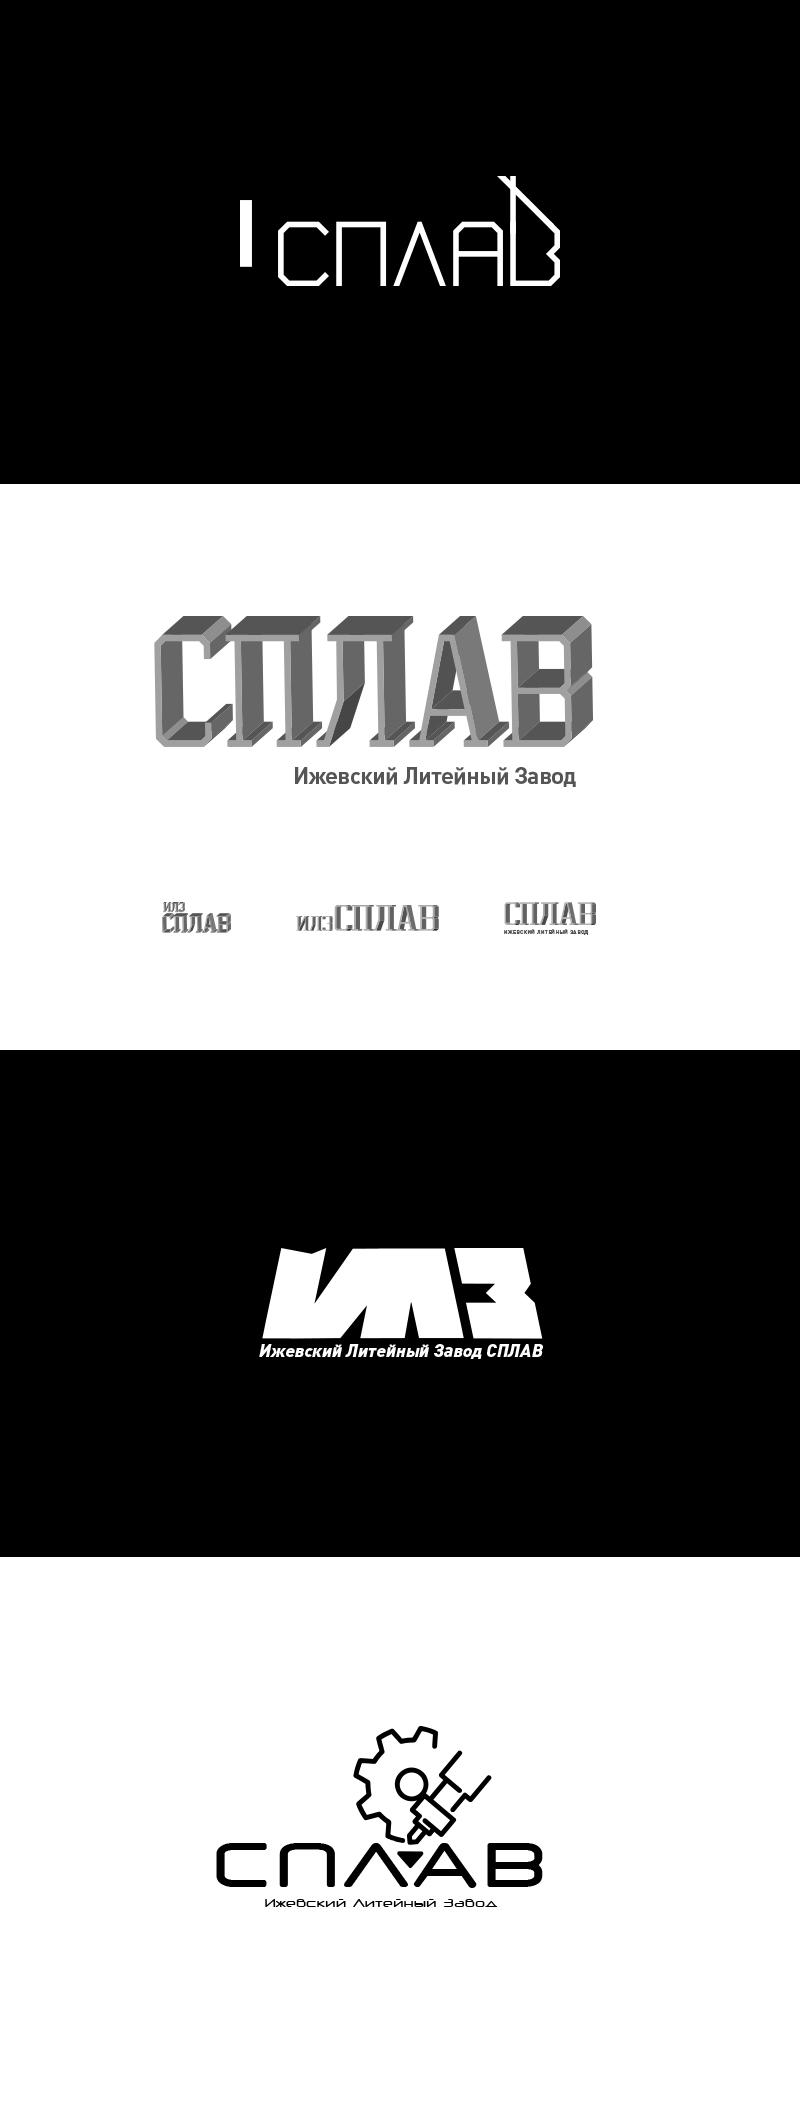 Разработать логотип для литейного завода фото f_8035b029df0d9a56.jpg